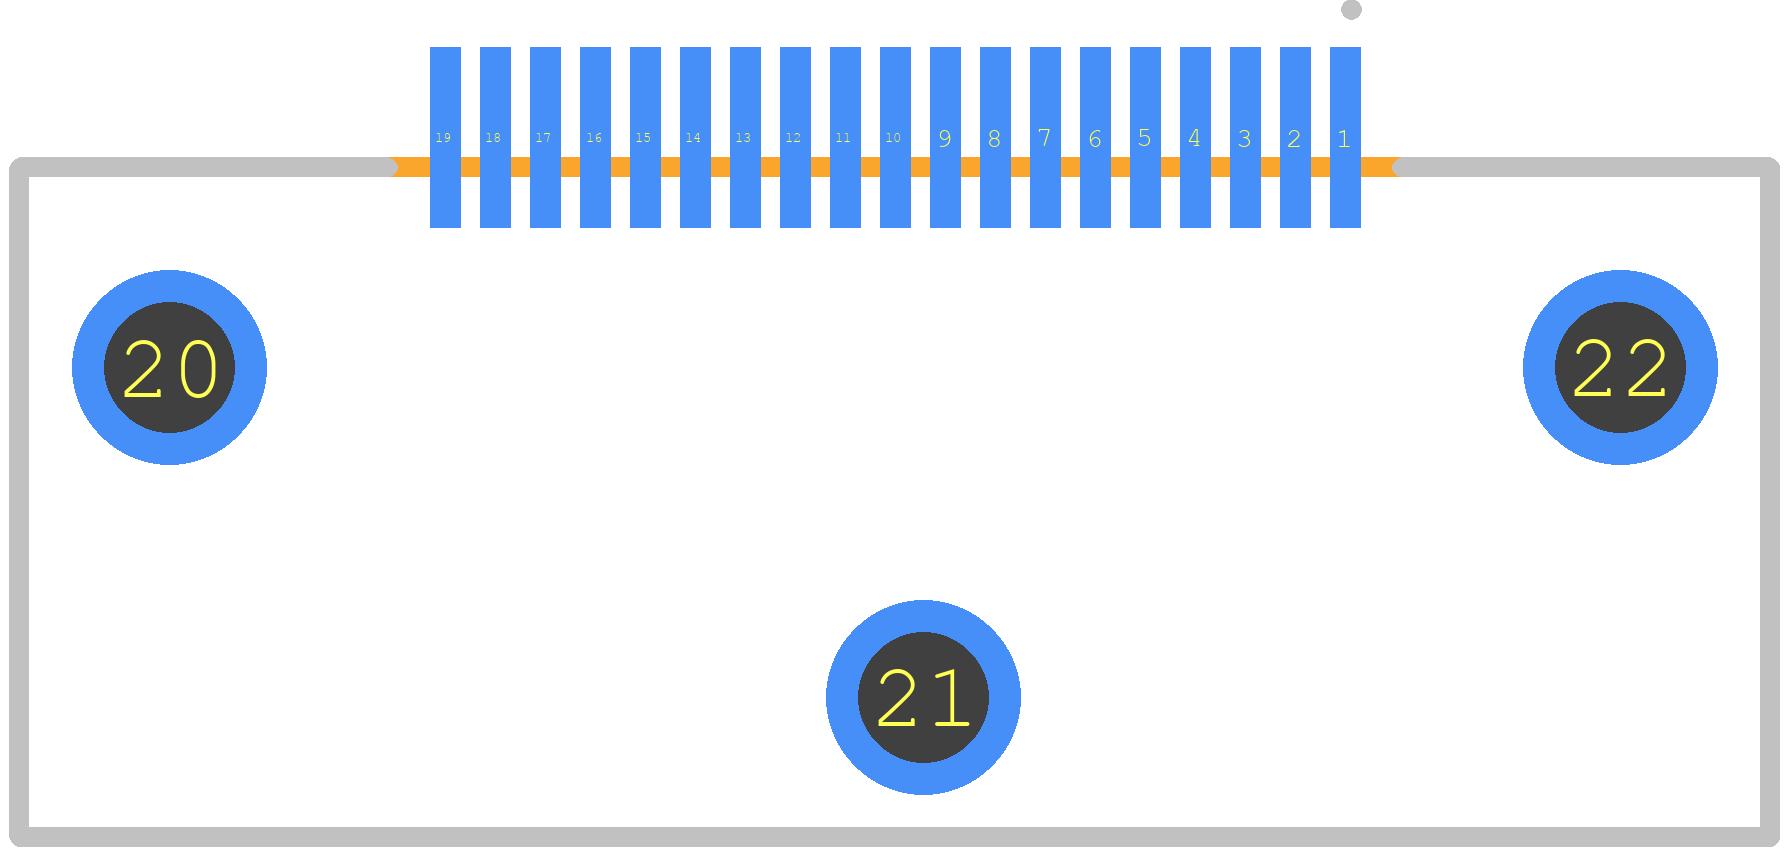 47659 1000 Molex Pcb Footprint Symbol Download Displayport Schematic Other